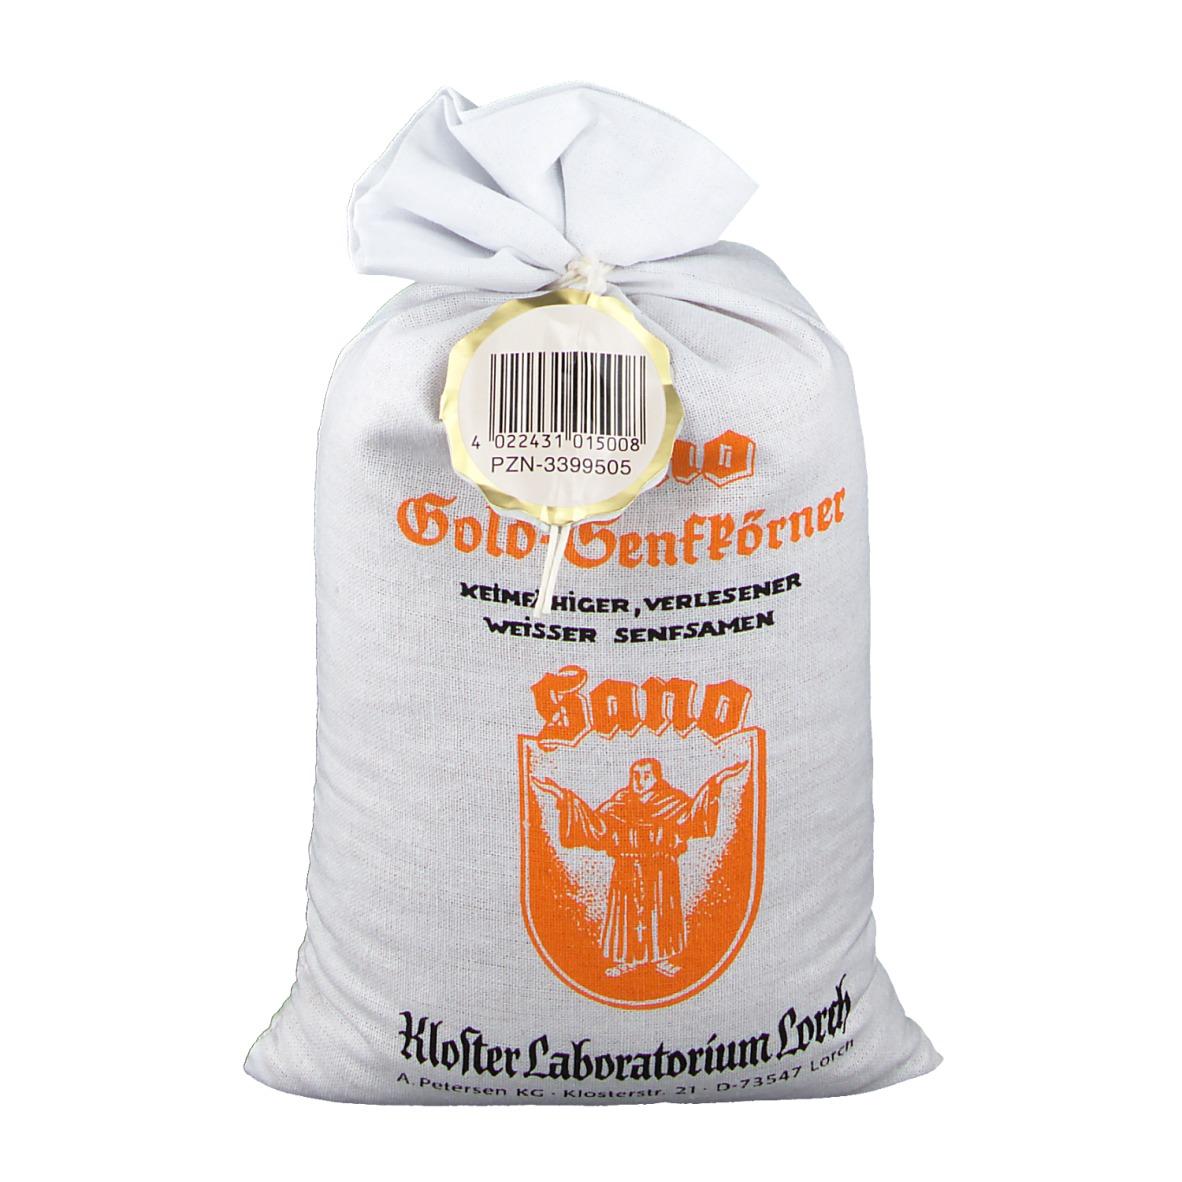 Sano Gold-Senfkörner 500 g Samen